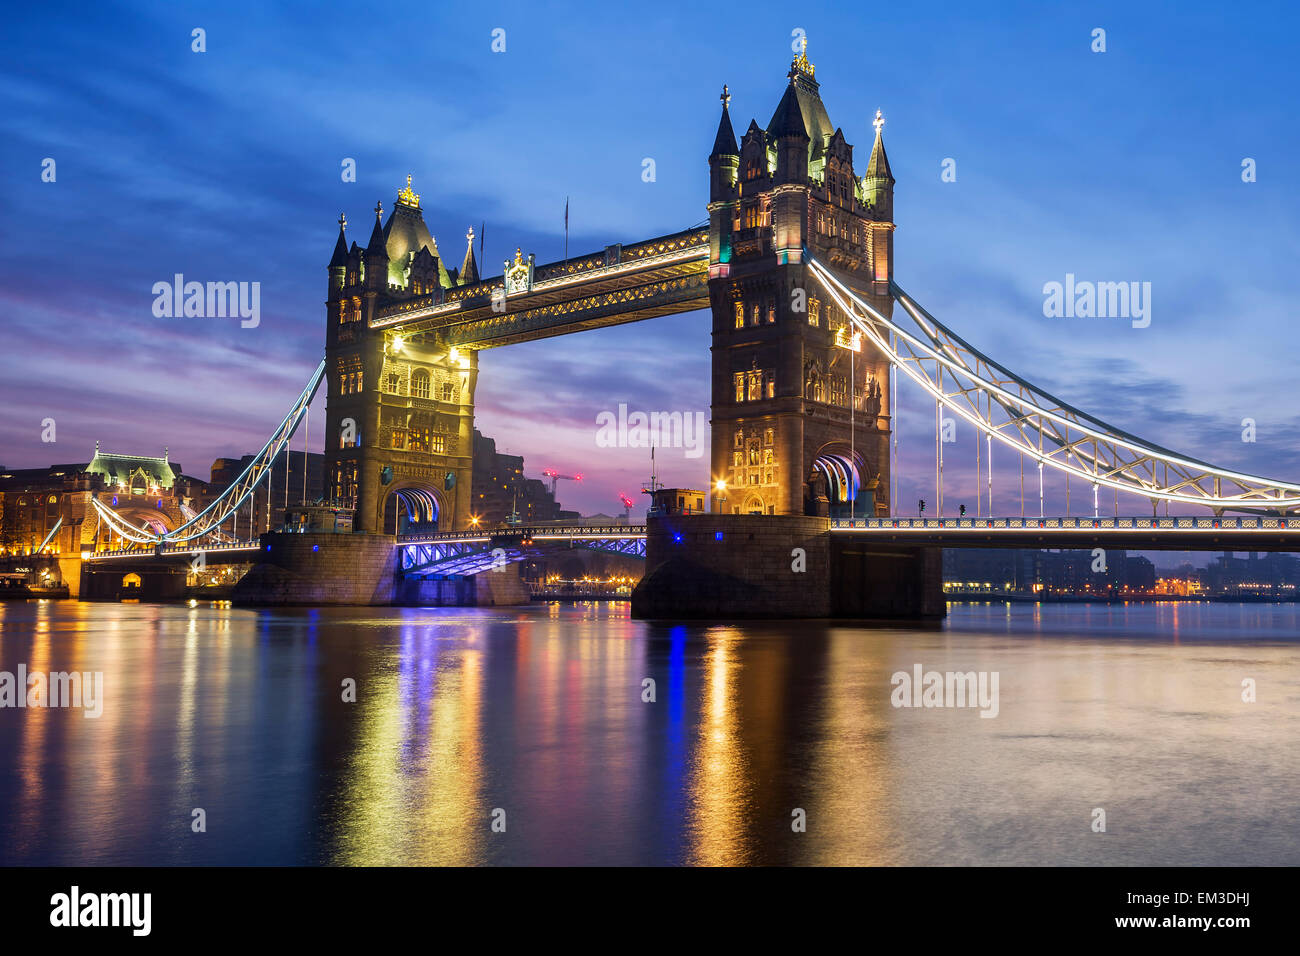 Famoso Puente de la torre en la noche, Londres, Inglaterra Imagen De Stock